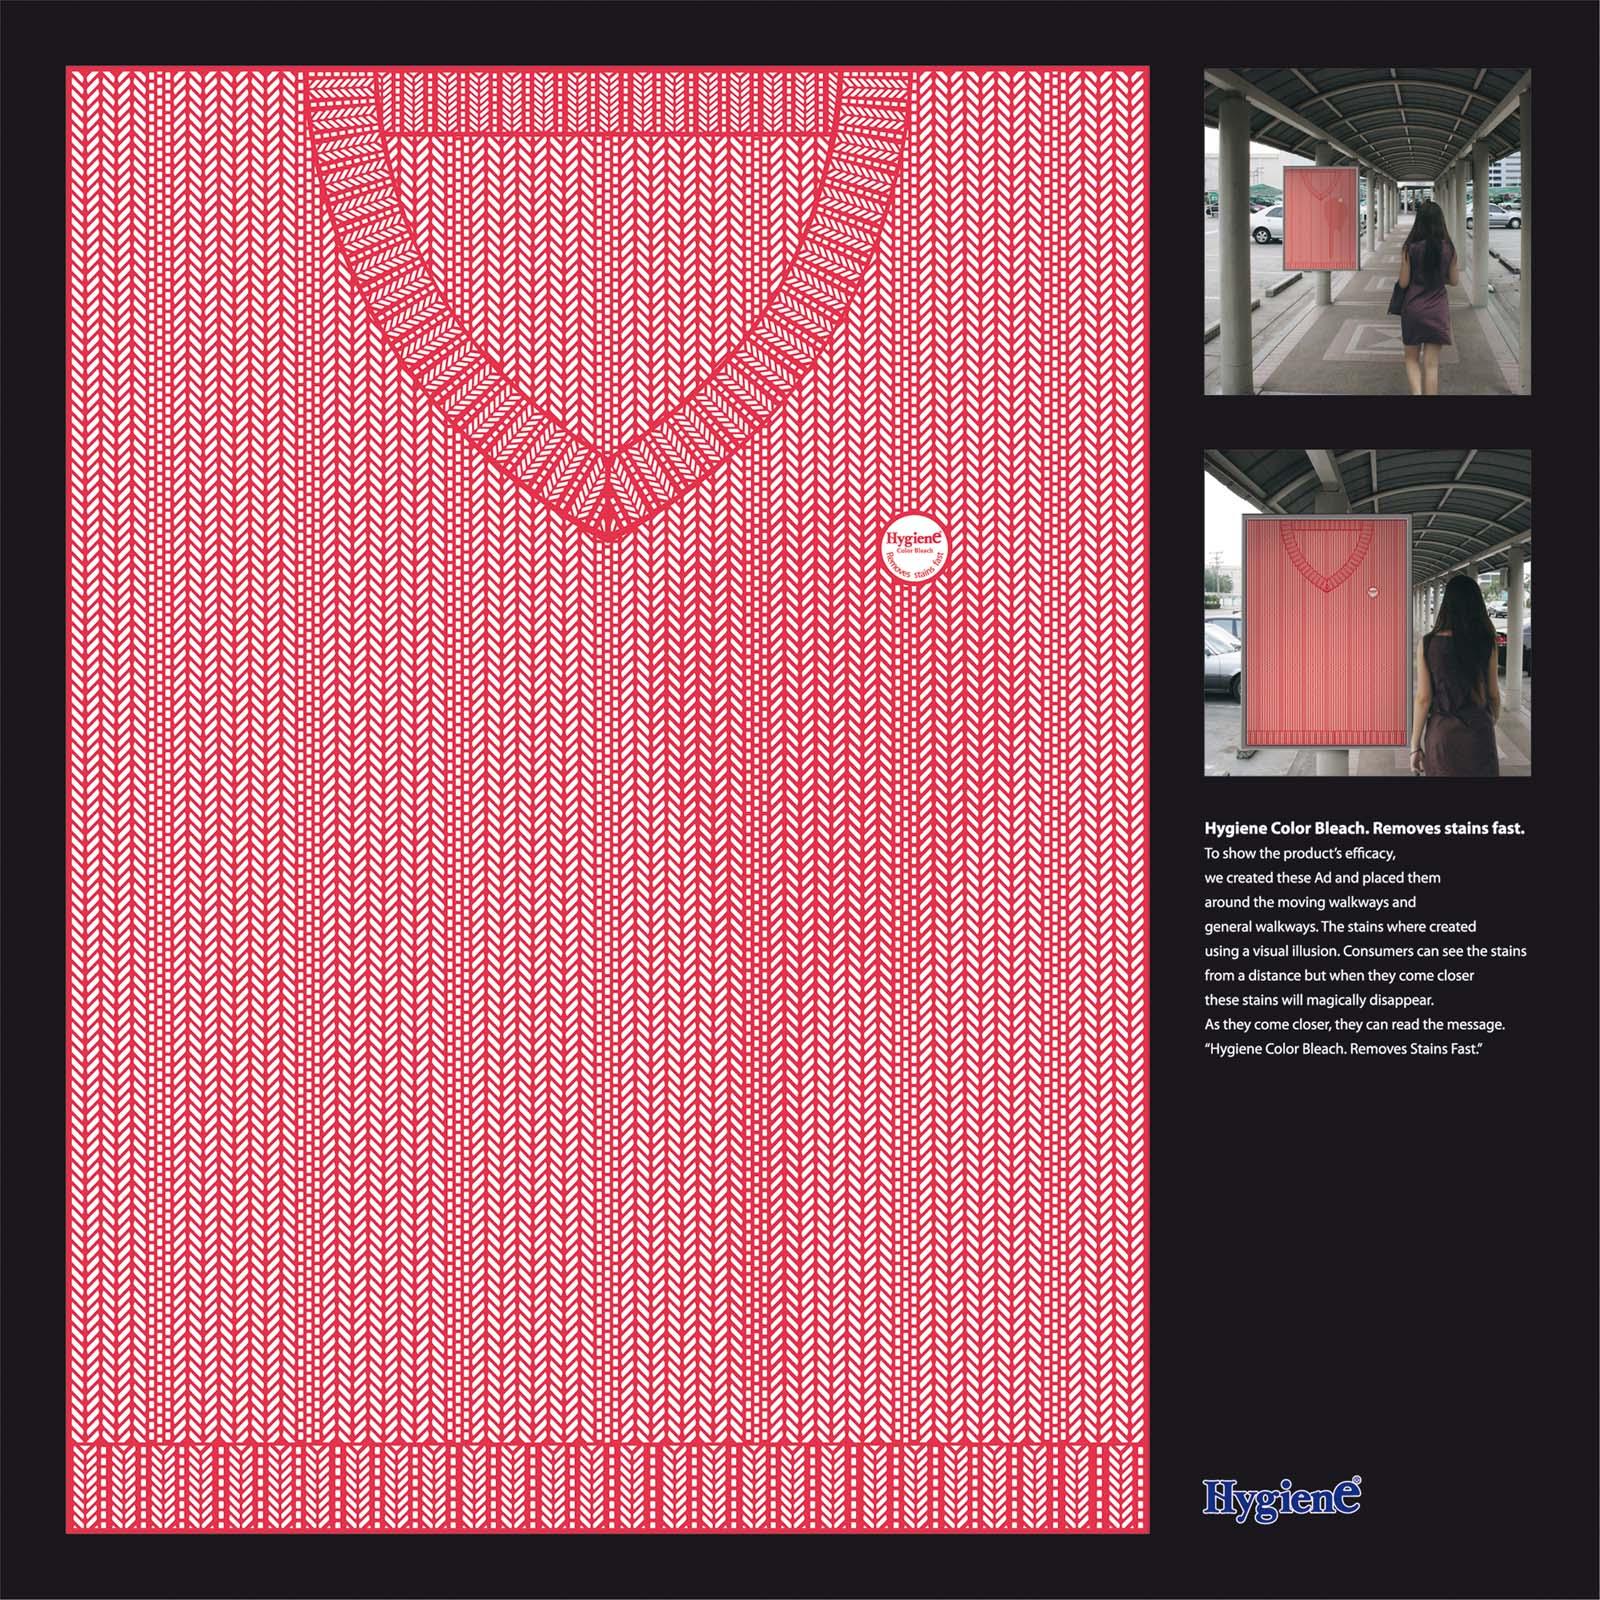 Hygiene Color Bleach Иллюзорные пятна